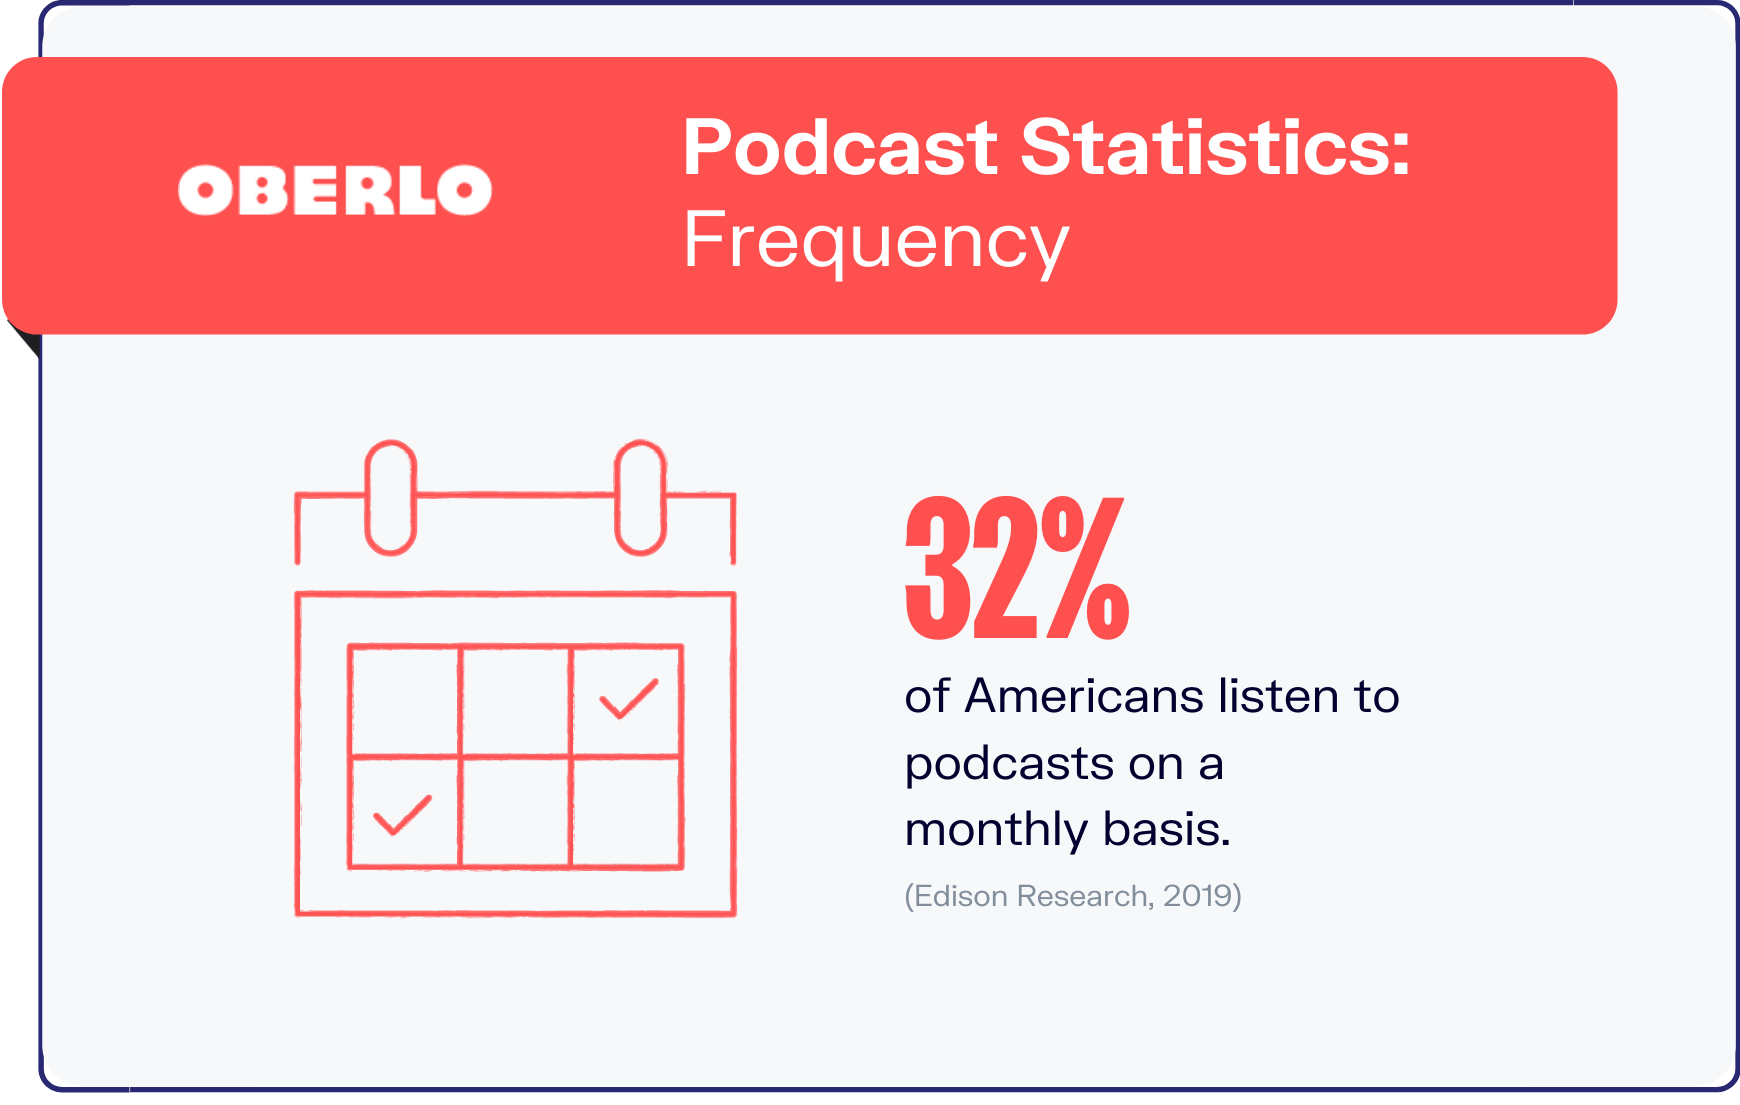 podcast statistics graphic 5